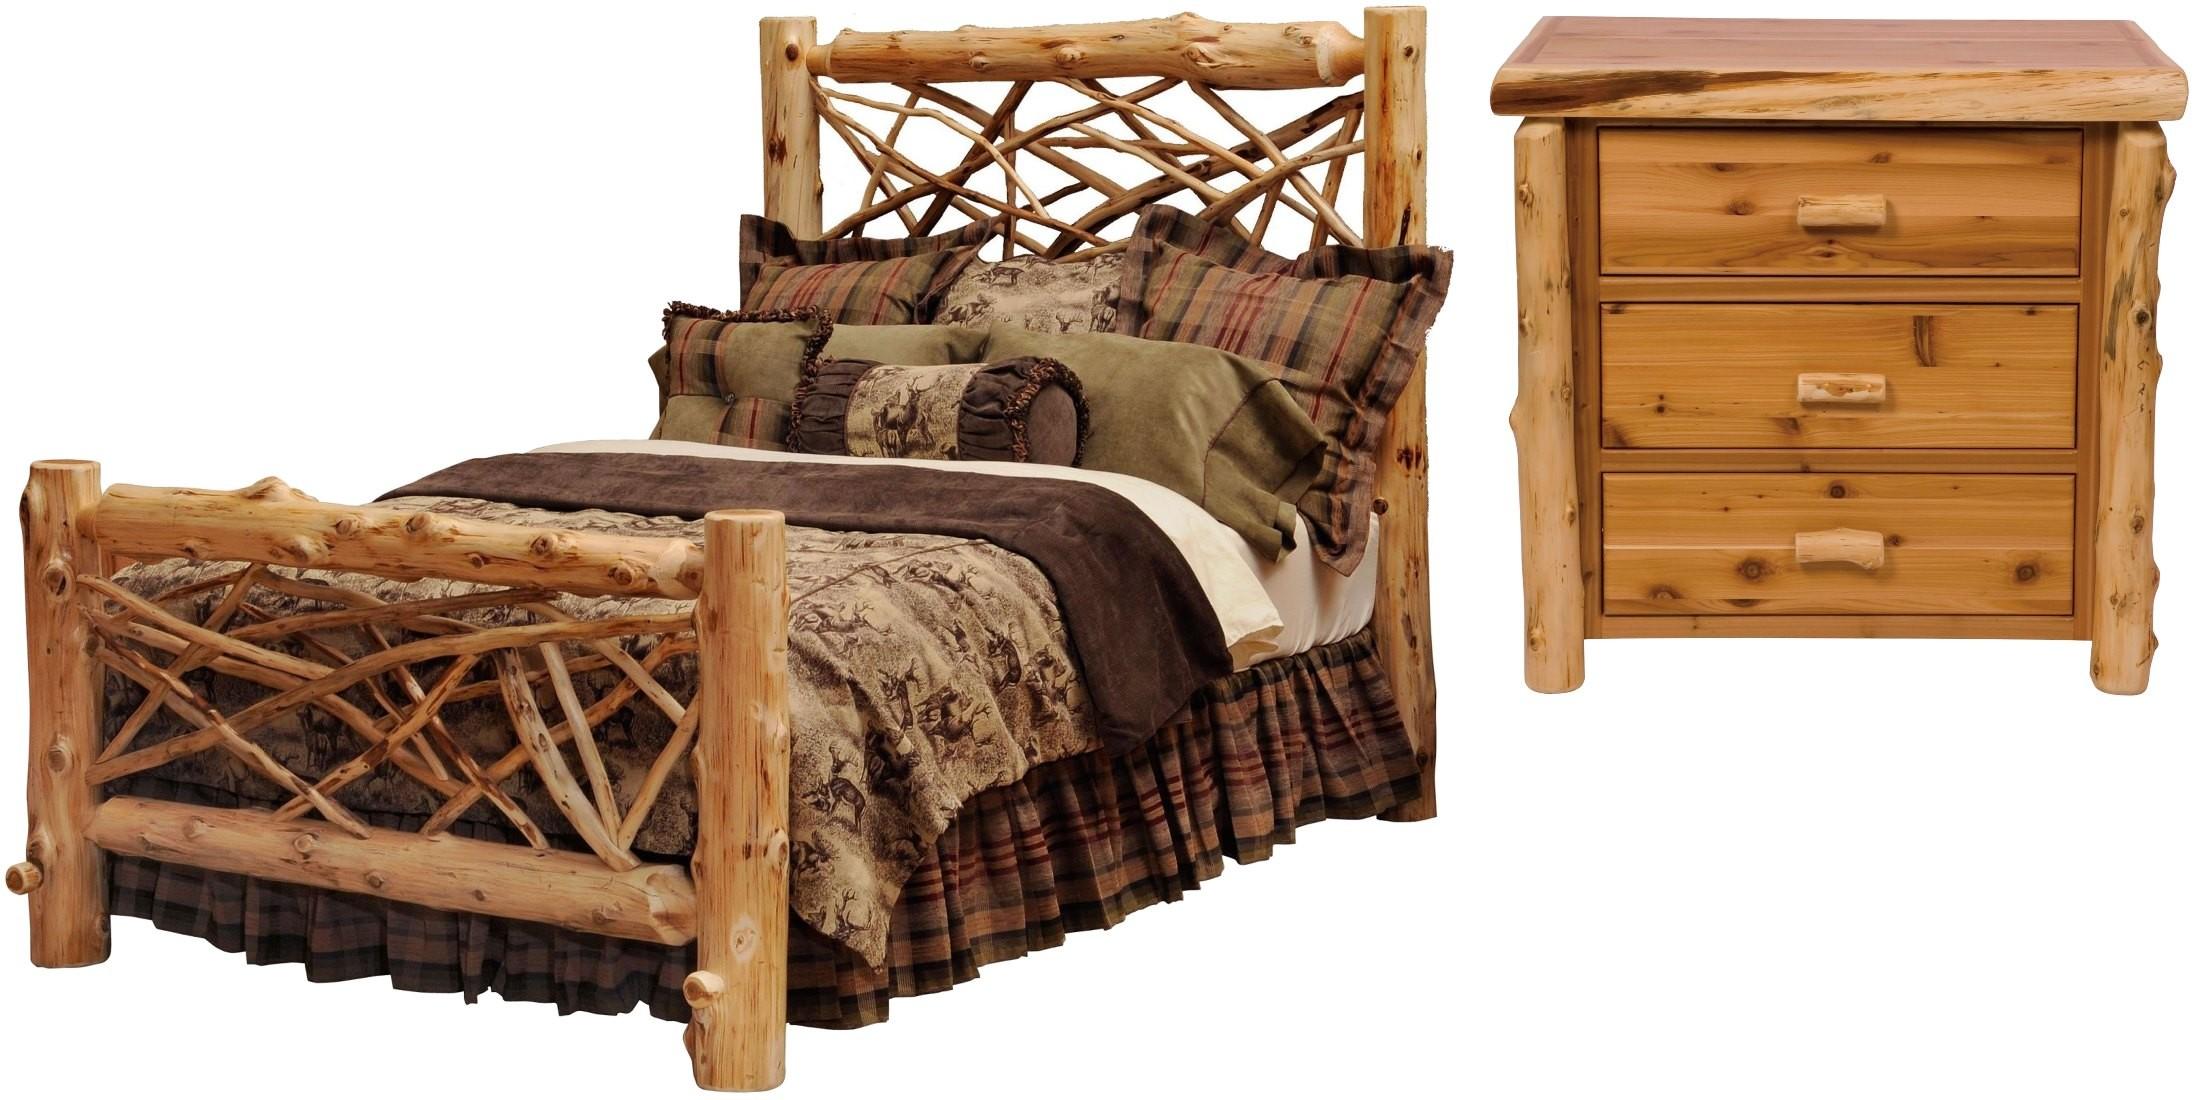 Traditional cedar twig bedroom set from fireside lodge 10043 coleman furniture - Cedar bedroom furniture ...